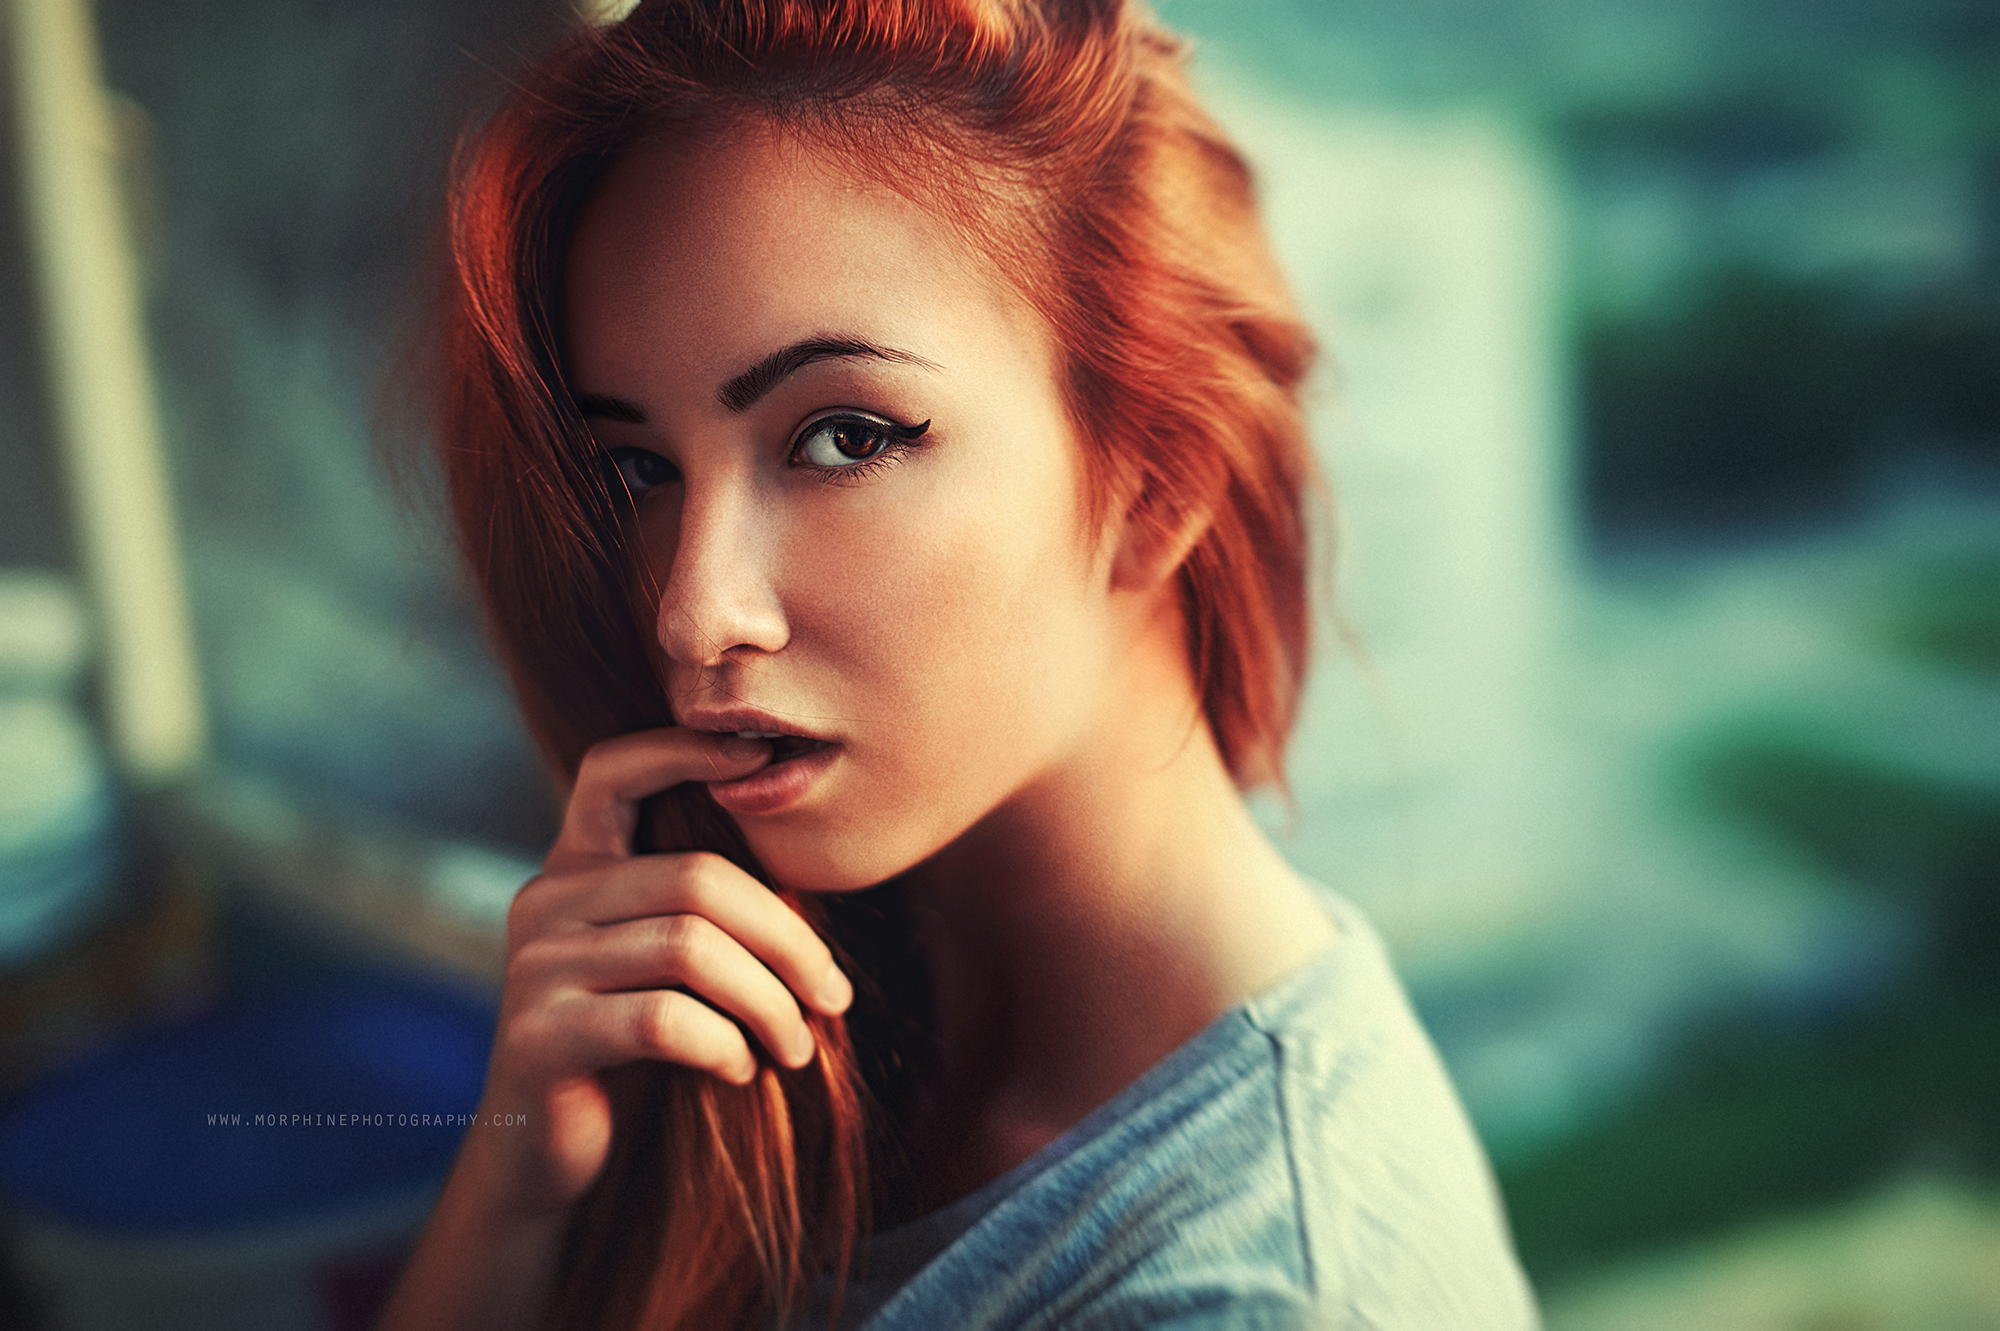 Nina redhead girlfriend mood naked pics